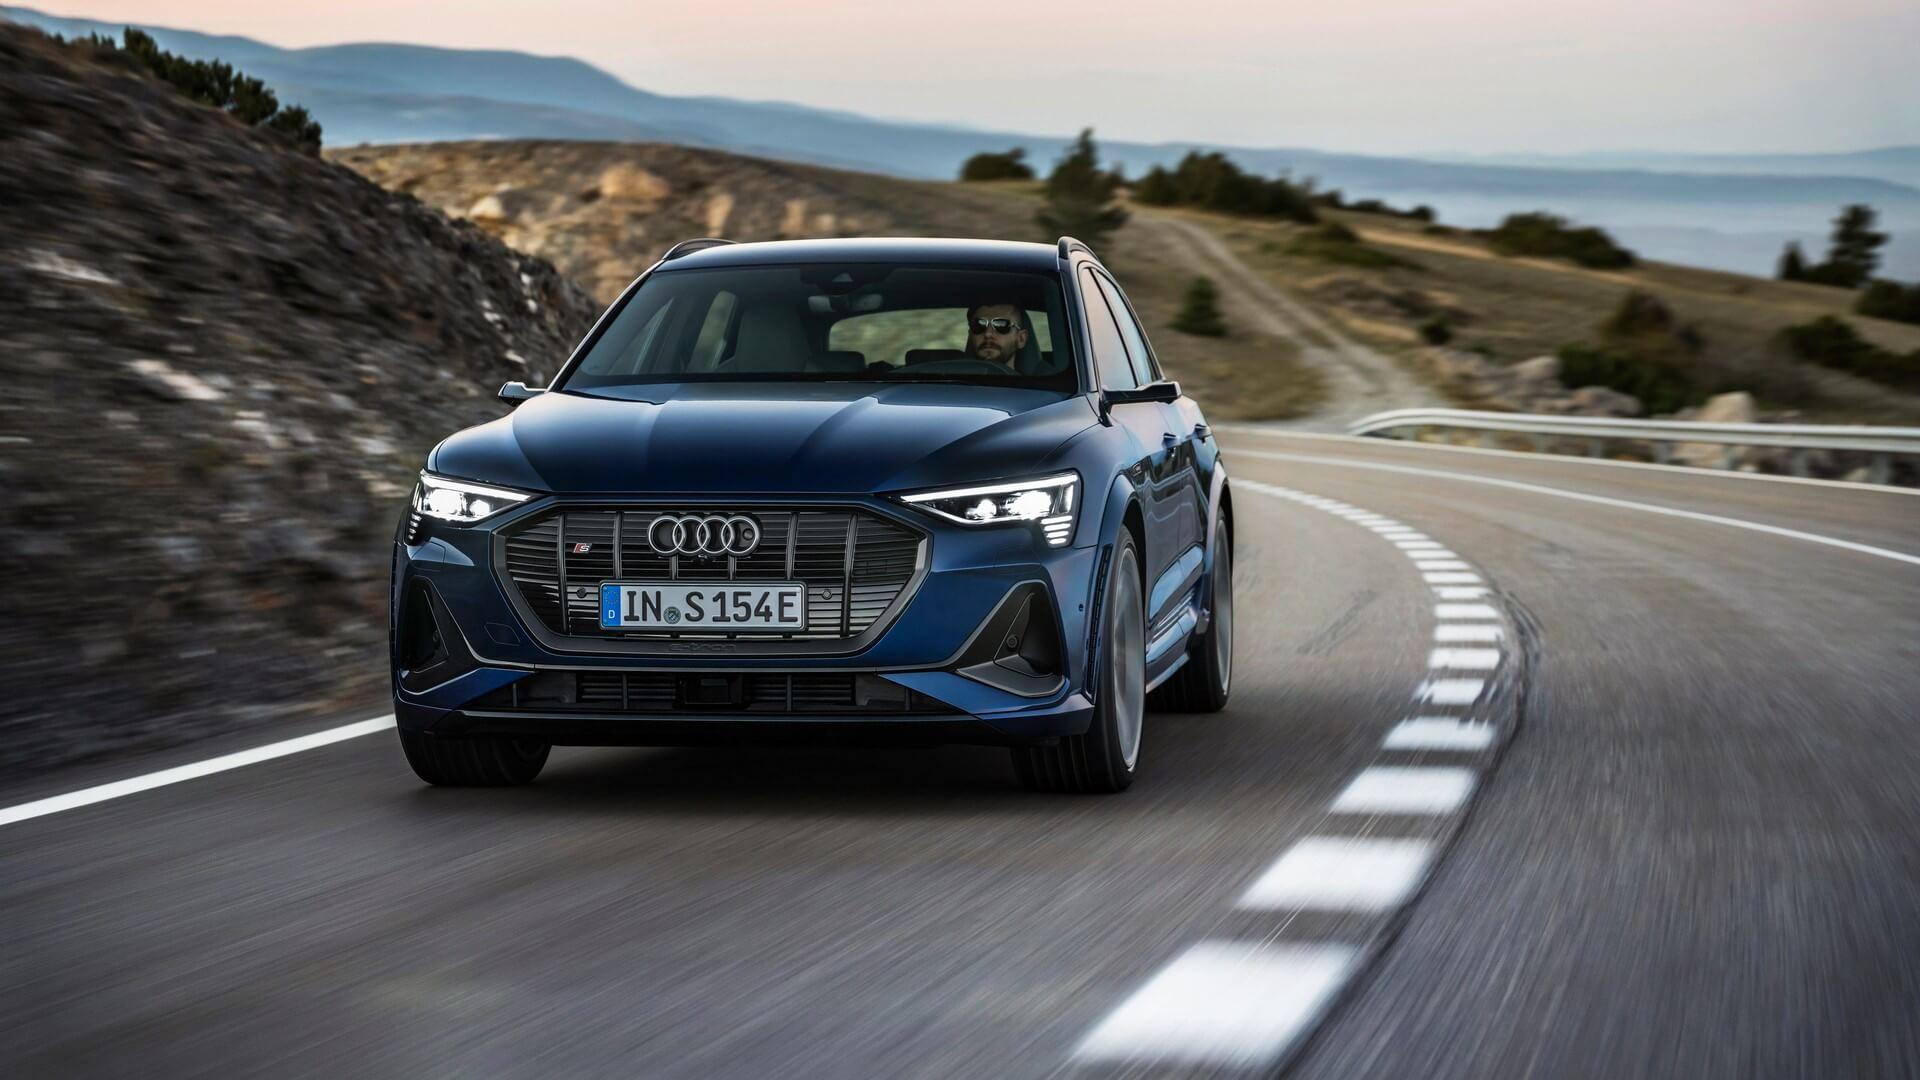 Audi-E-Tron-S-and-E-Tron-S-Sportback-2020-20